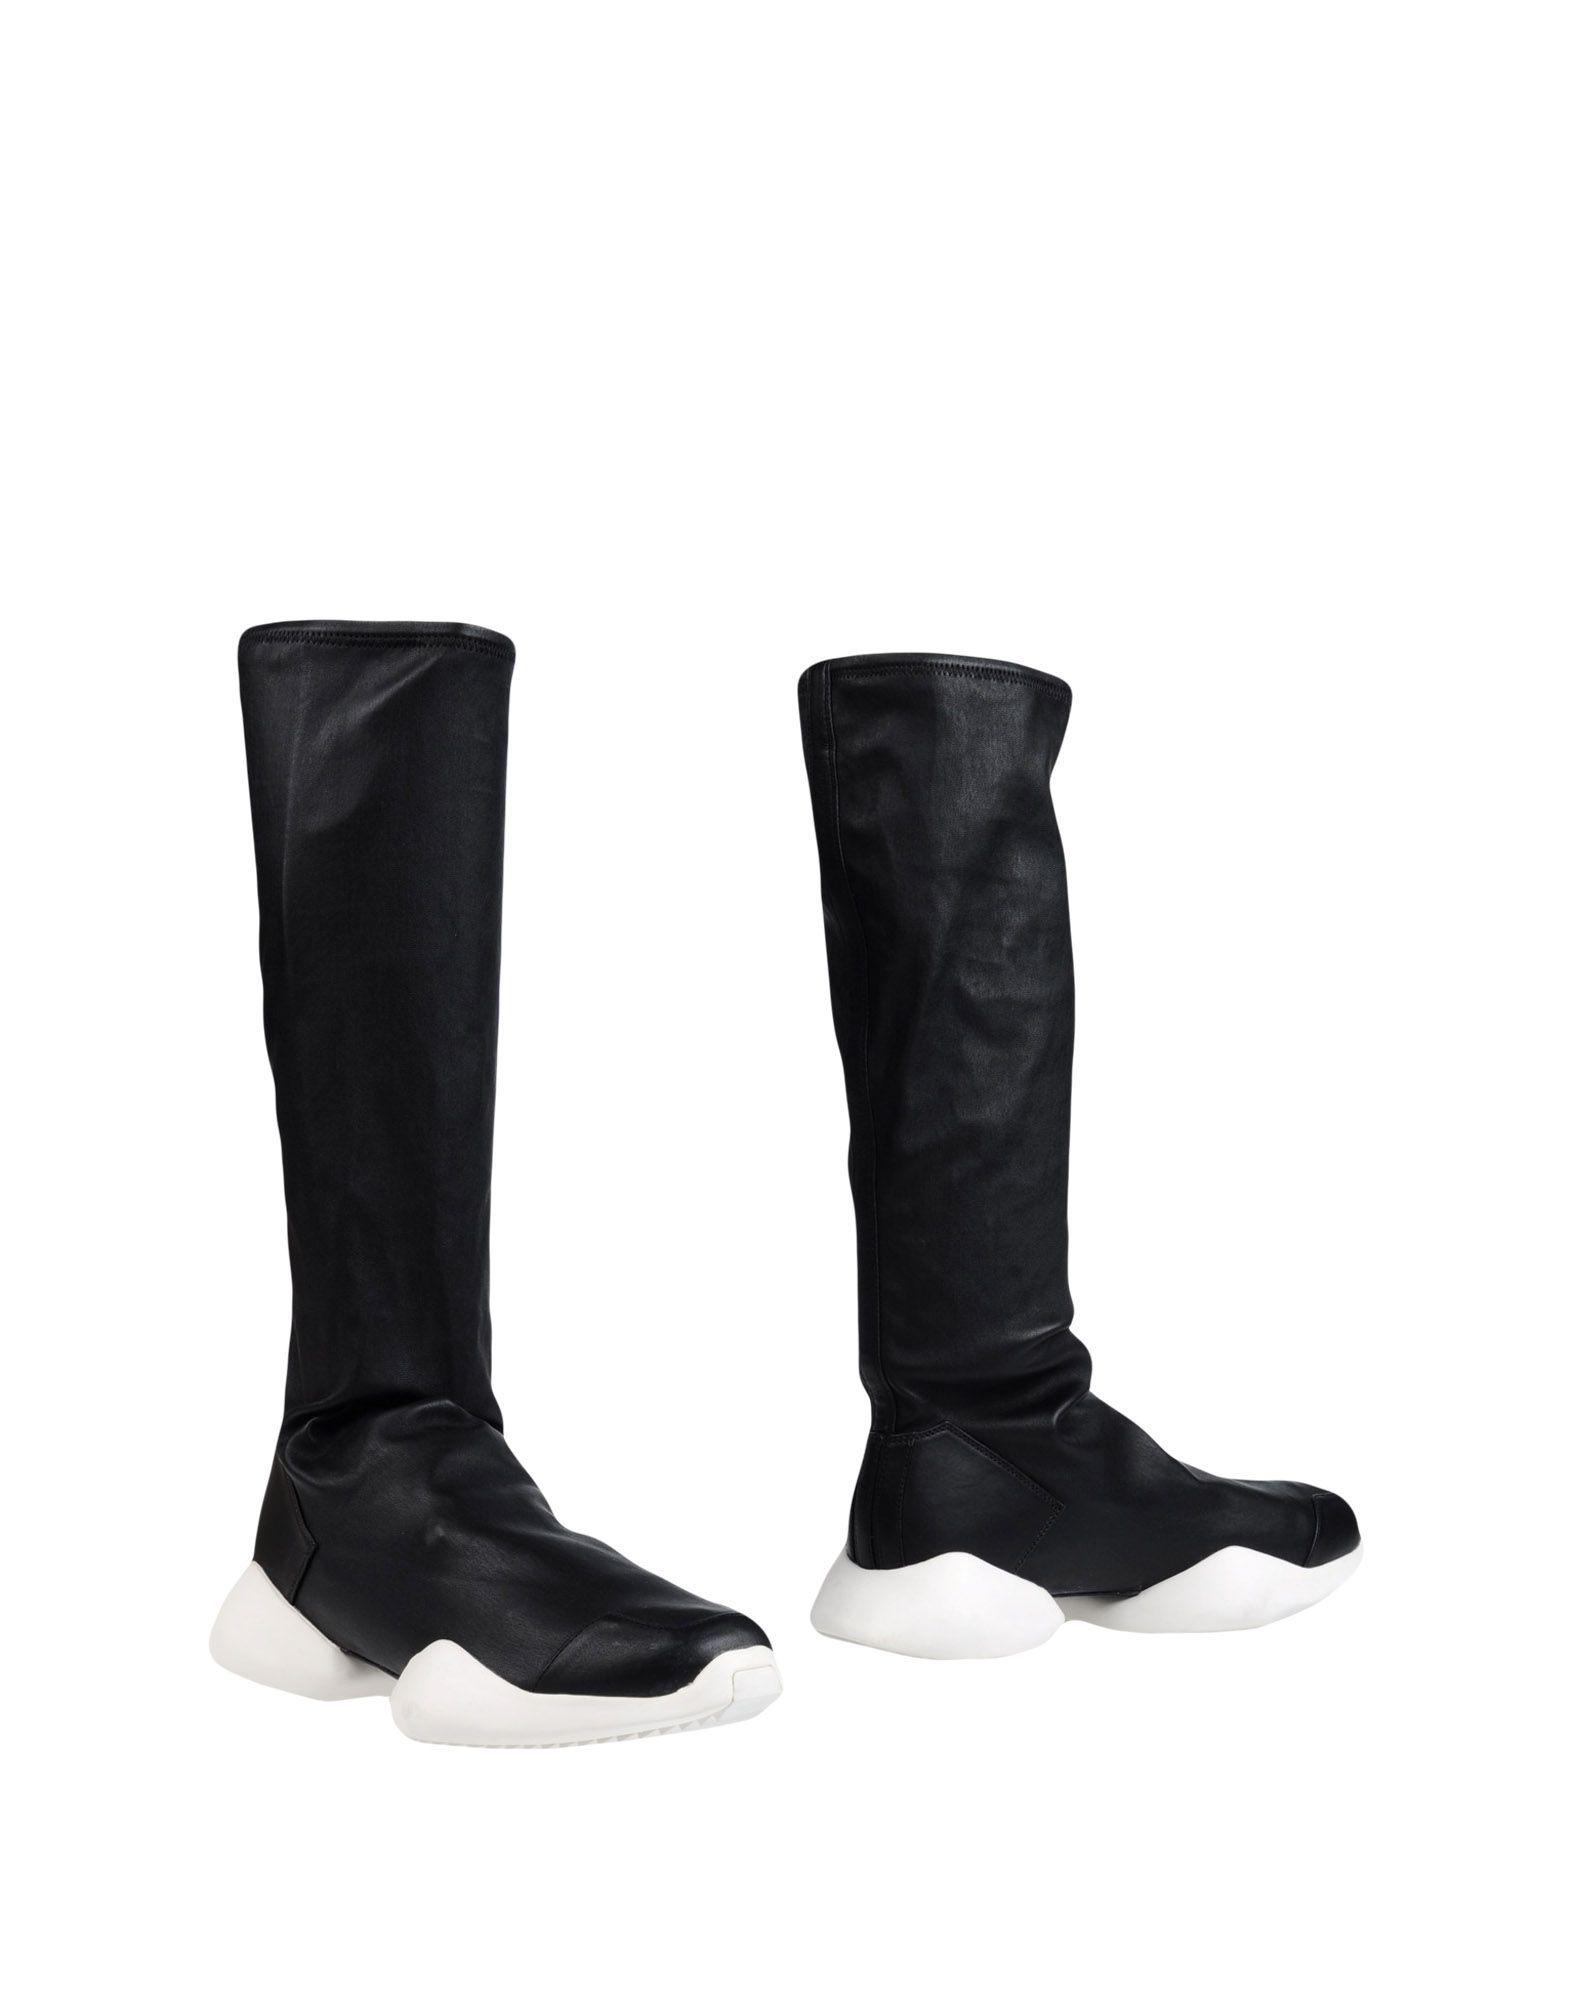 Rick Owens X Adidas Man Boots Leather